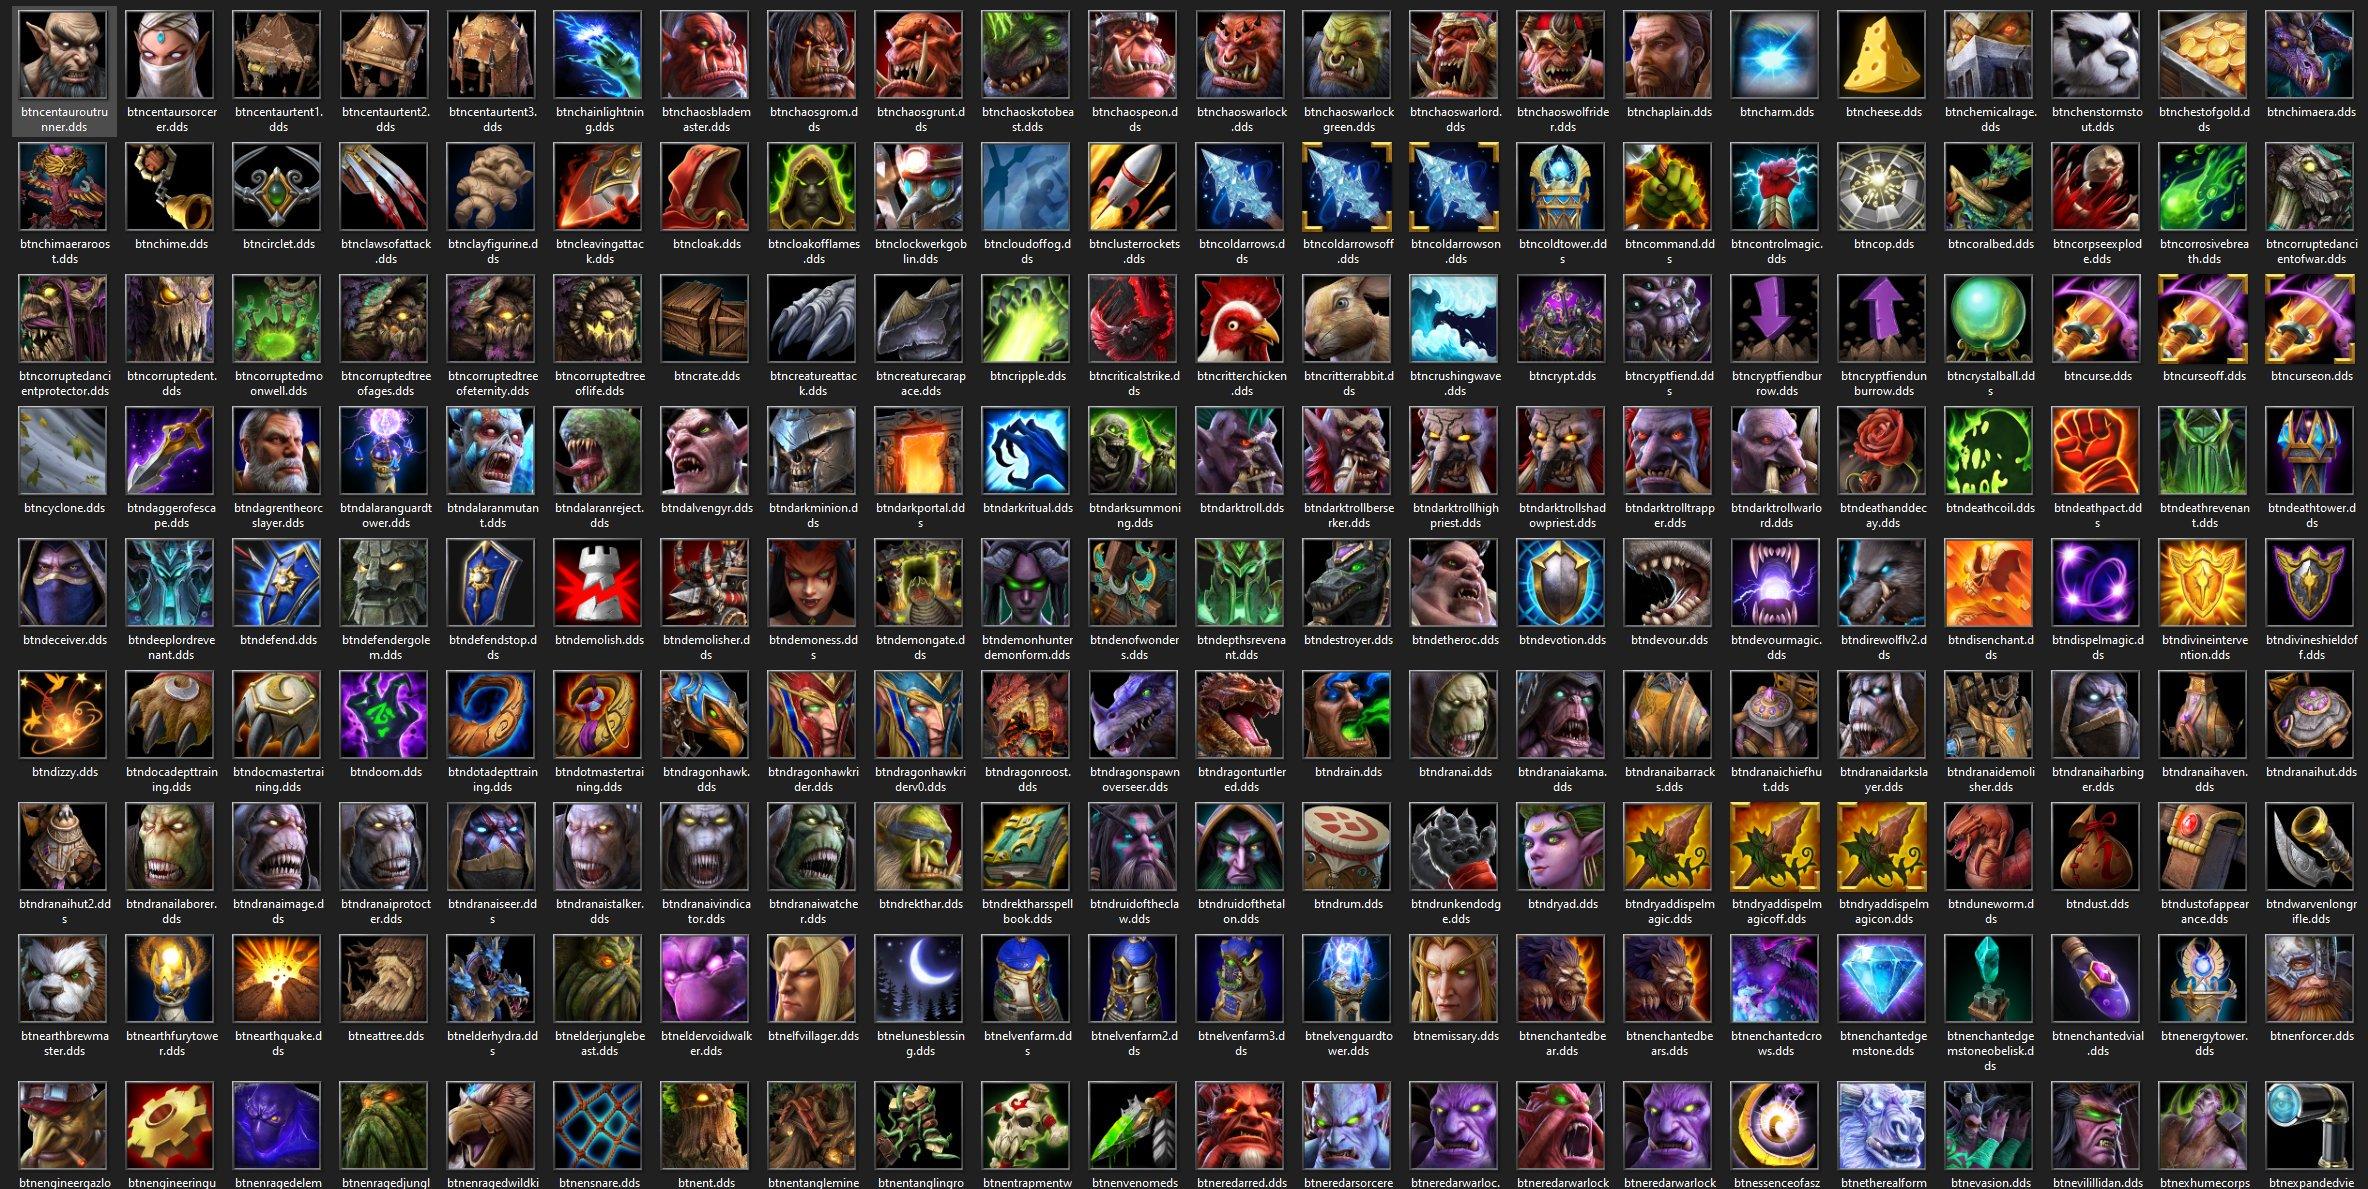 https://xgm.guru/p/wc3/Ikonki-iz-Reforged-dlya-Warcraft-3-Classic-lpc